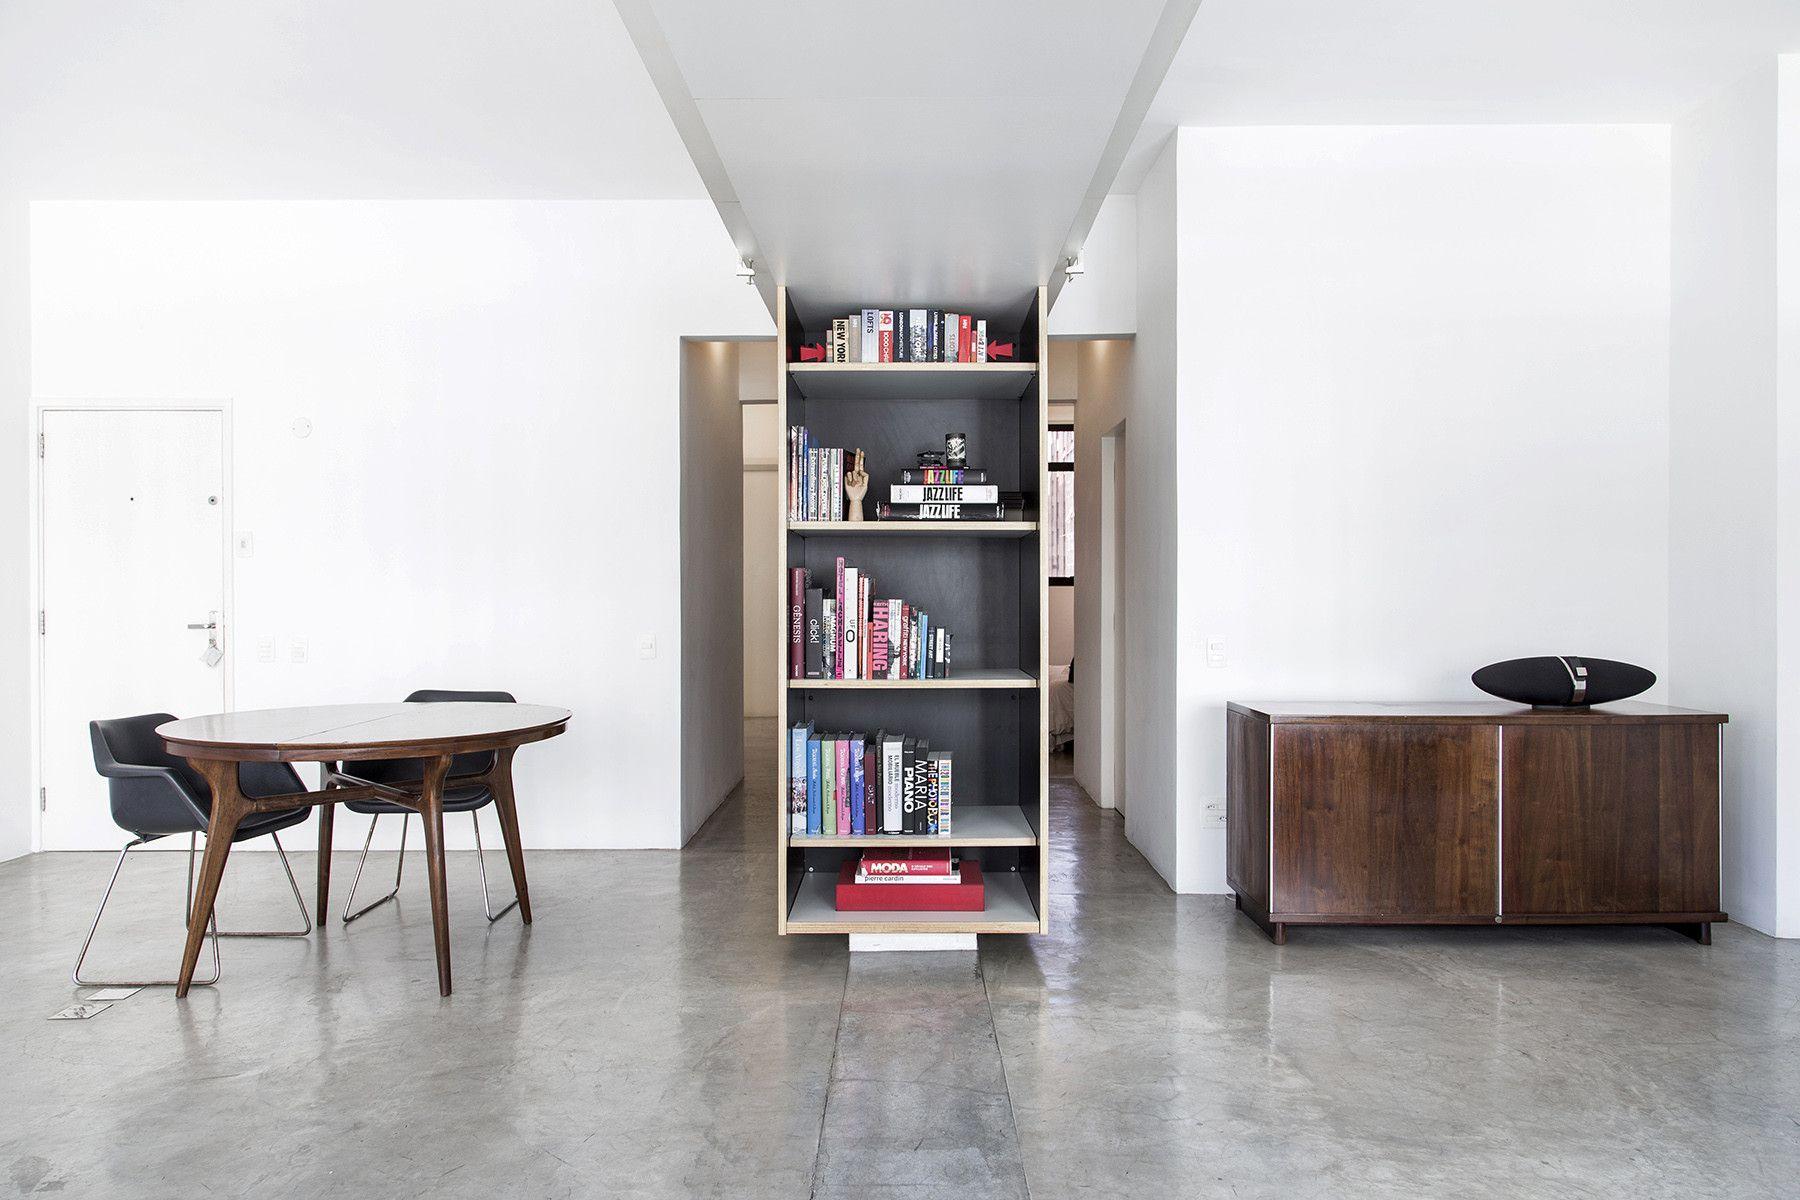 Apartamento en Edificio Pauliceia / JPG.ARQ